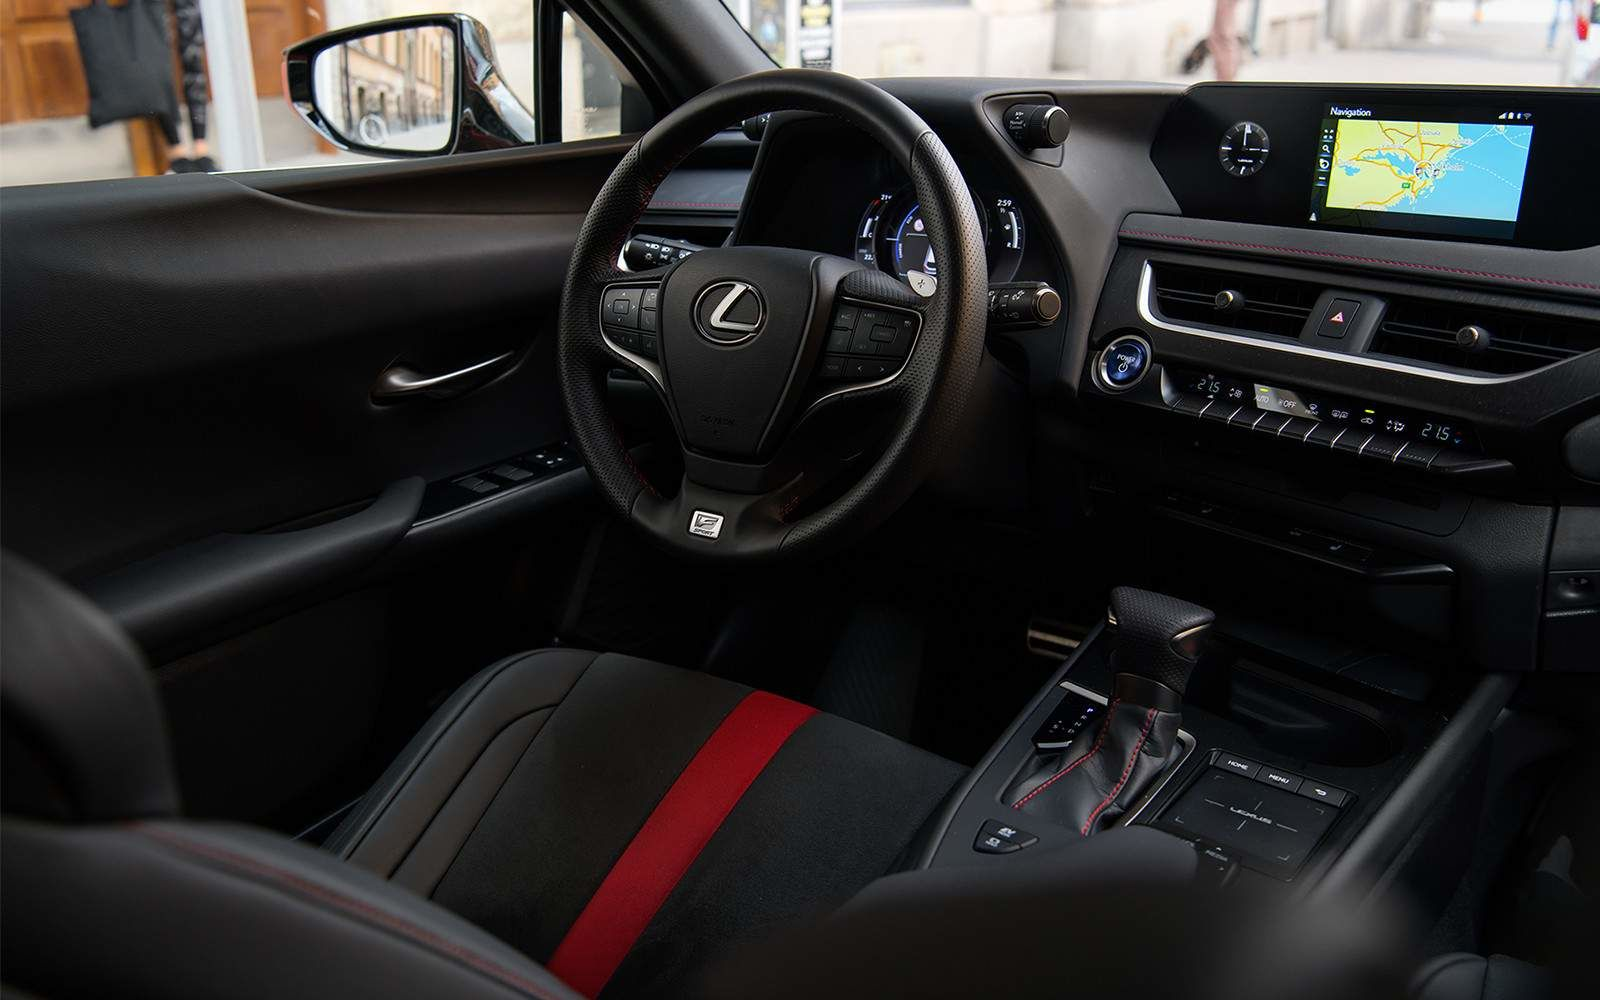 2020 Lexus UX Interior at Ken Shaw Lexus in Toronto